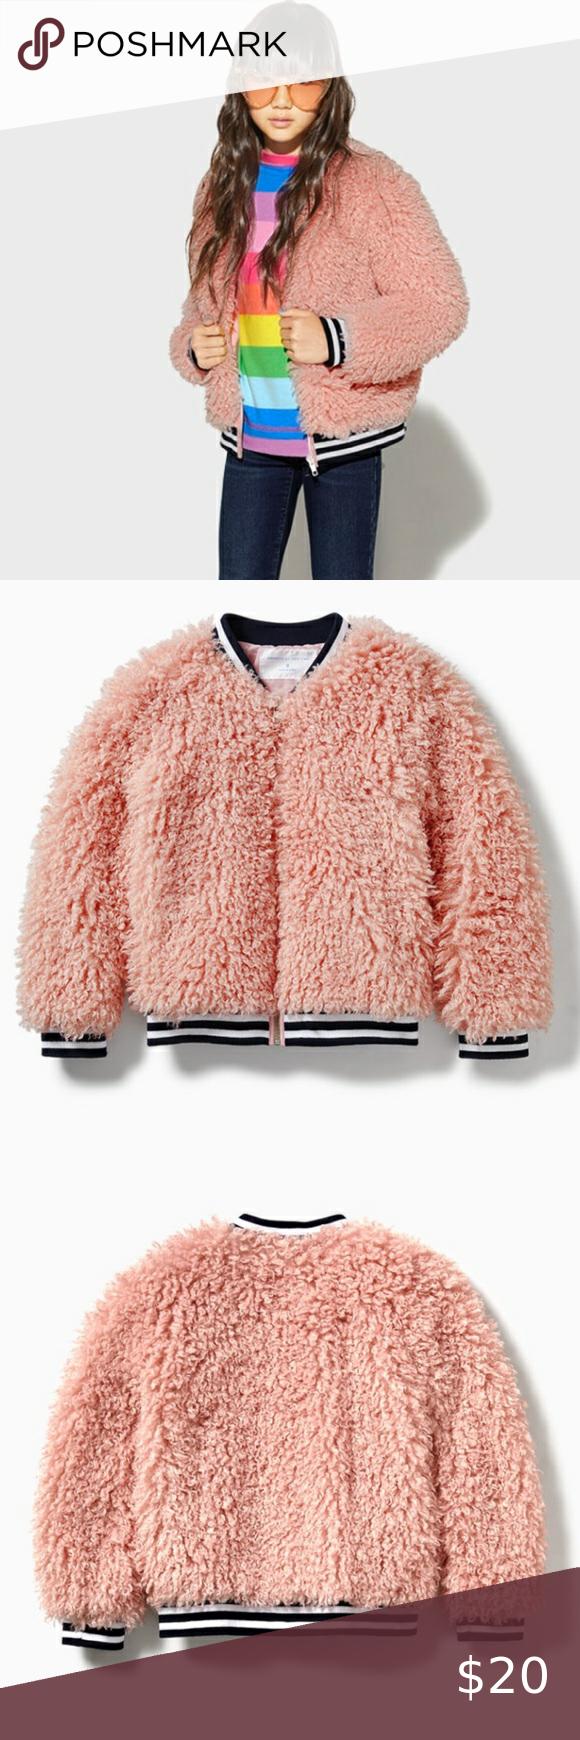 Fuzzy Bomber Jacket Clothes Design Bomber Jacket Fashion [ 1740 x 580 Pixel ]